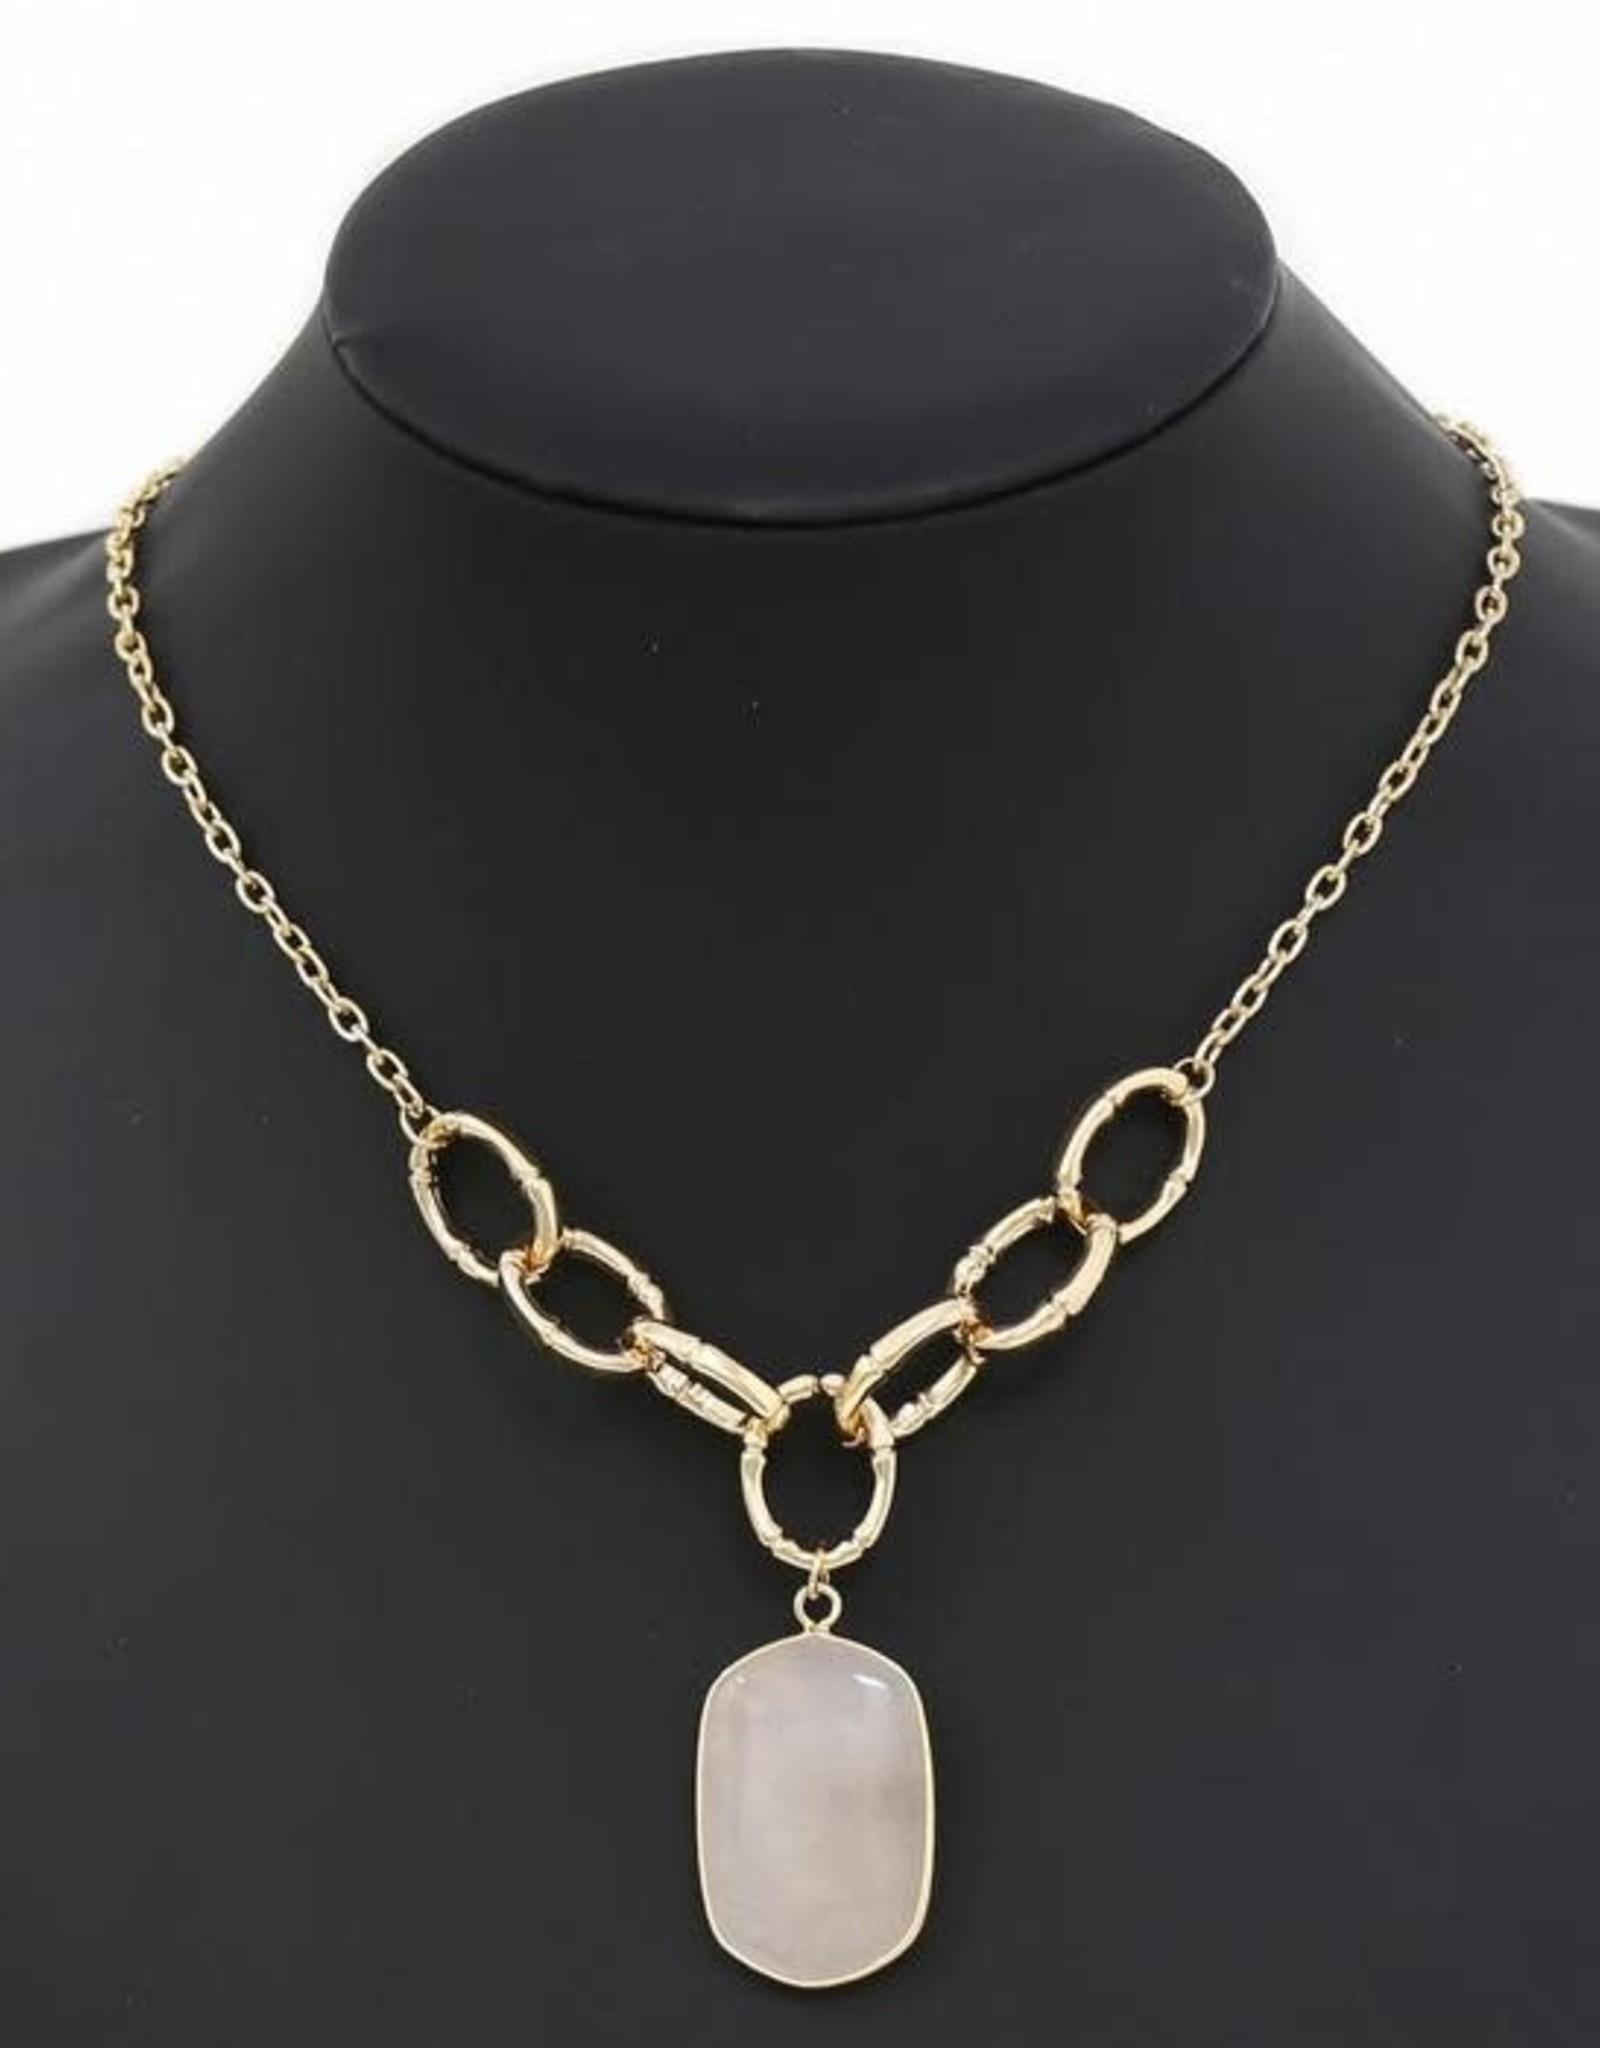 Natural Stone Pendant Short Chain Necklace - Peach